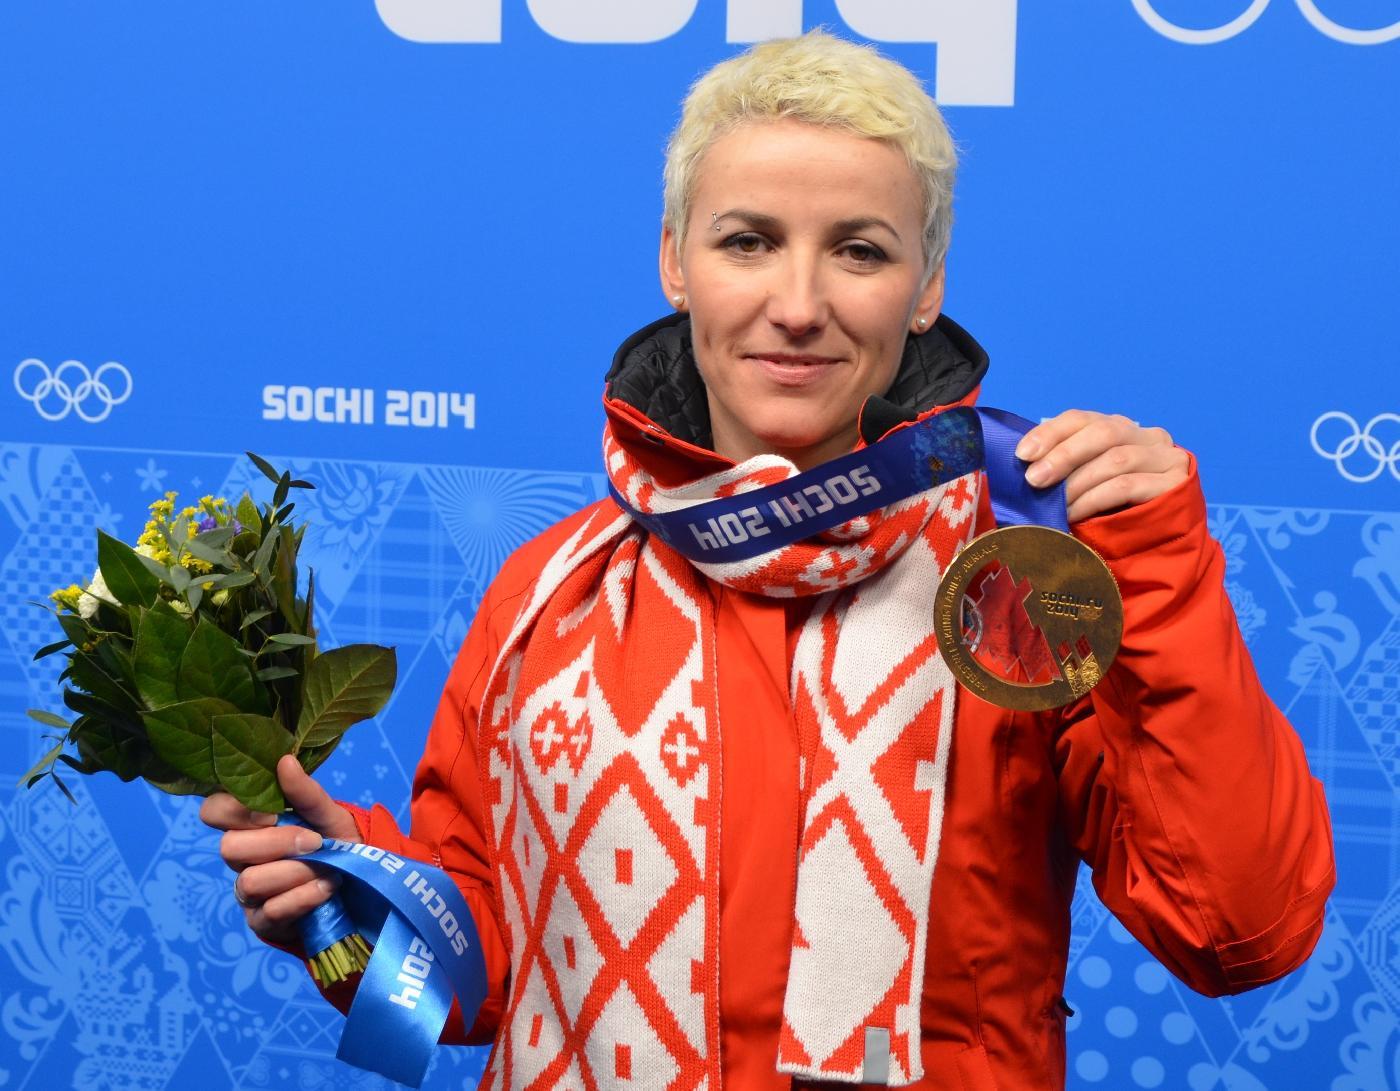 слон картинки спортсмены беларуси всем регулярно меряют